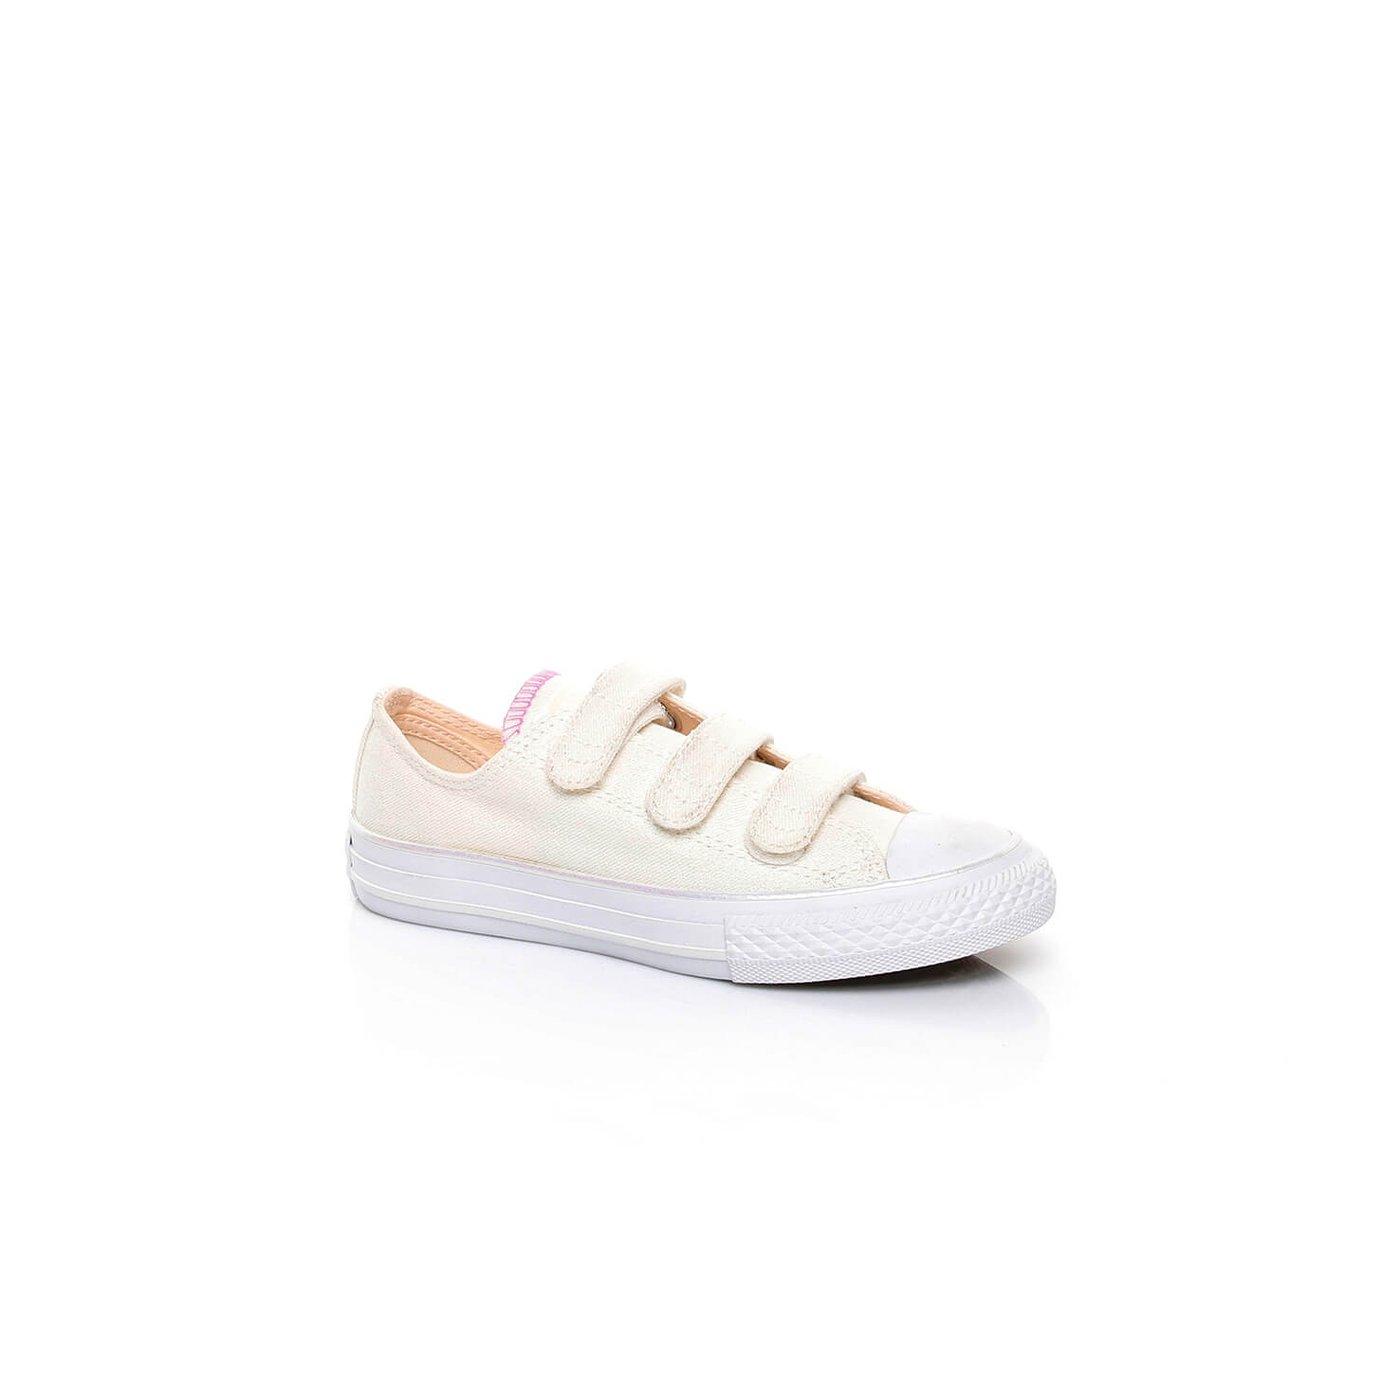 Converse Chuck Taylor All Star 3V Çocuk Pembe Sneaker